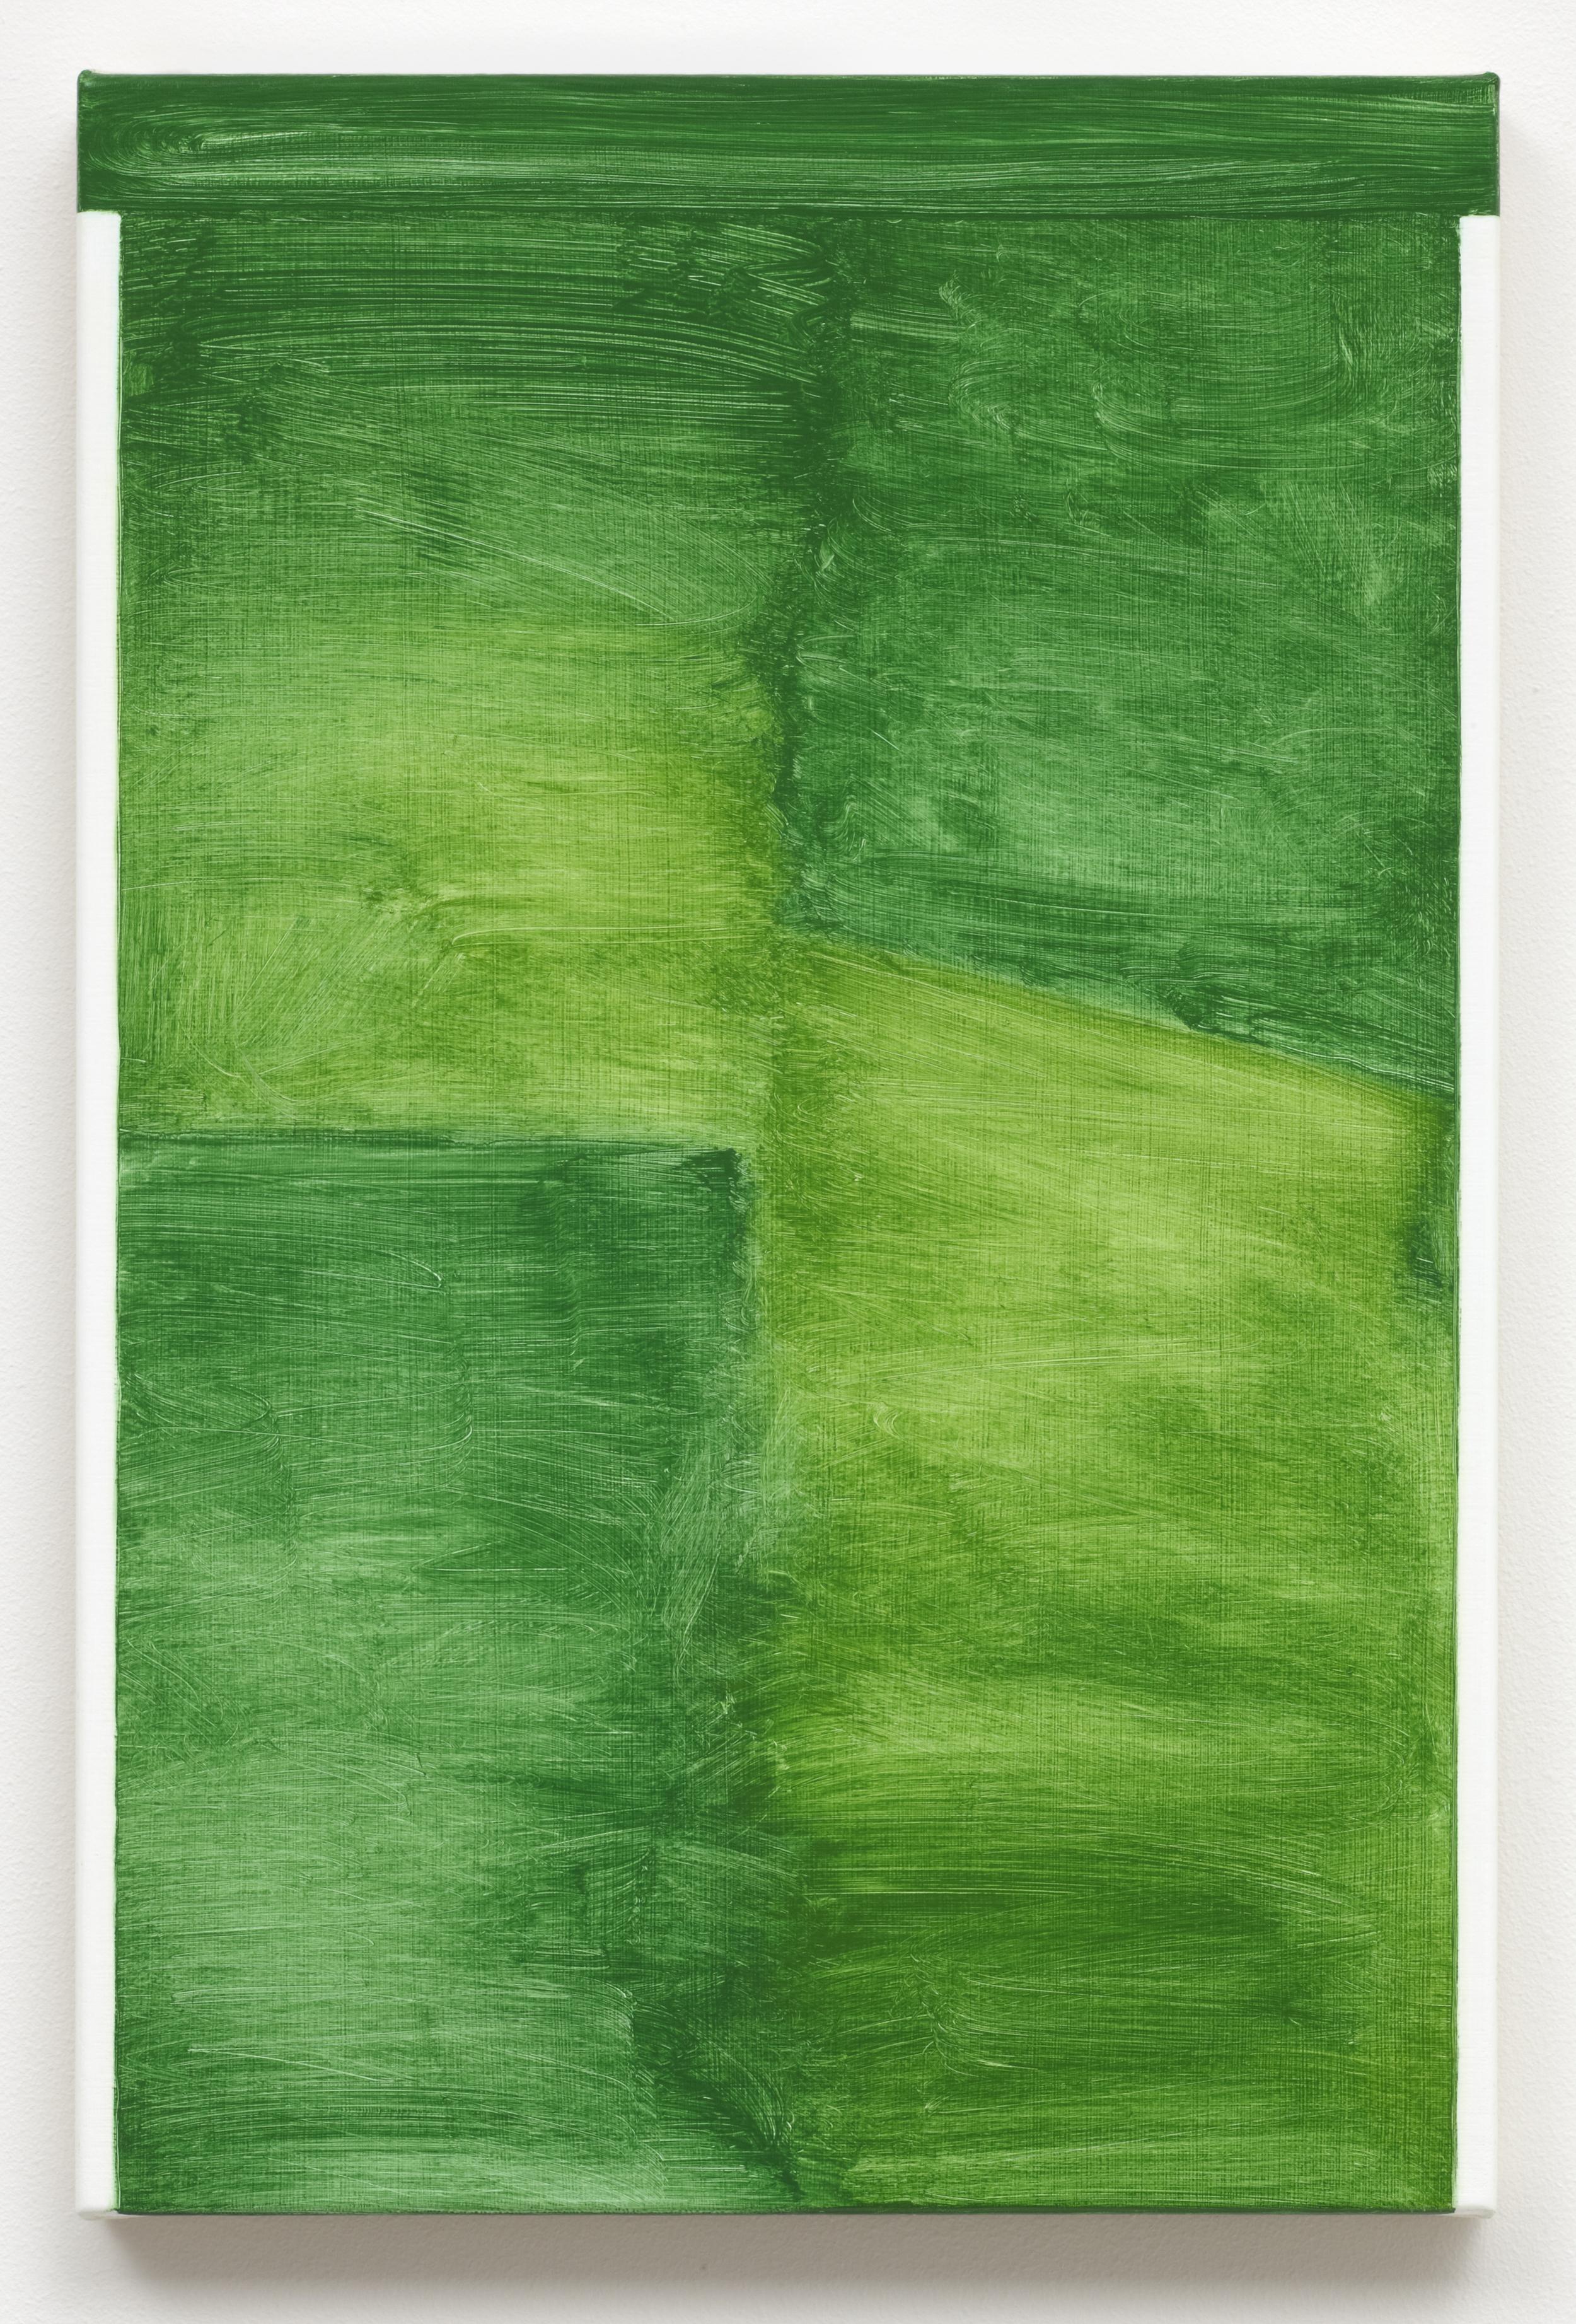 Untitled 2012 (RH4).jpg